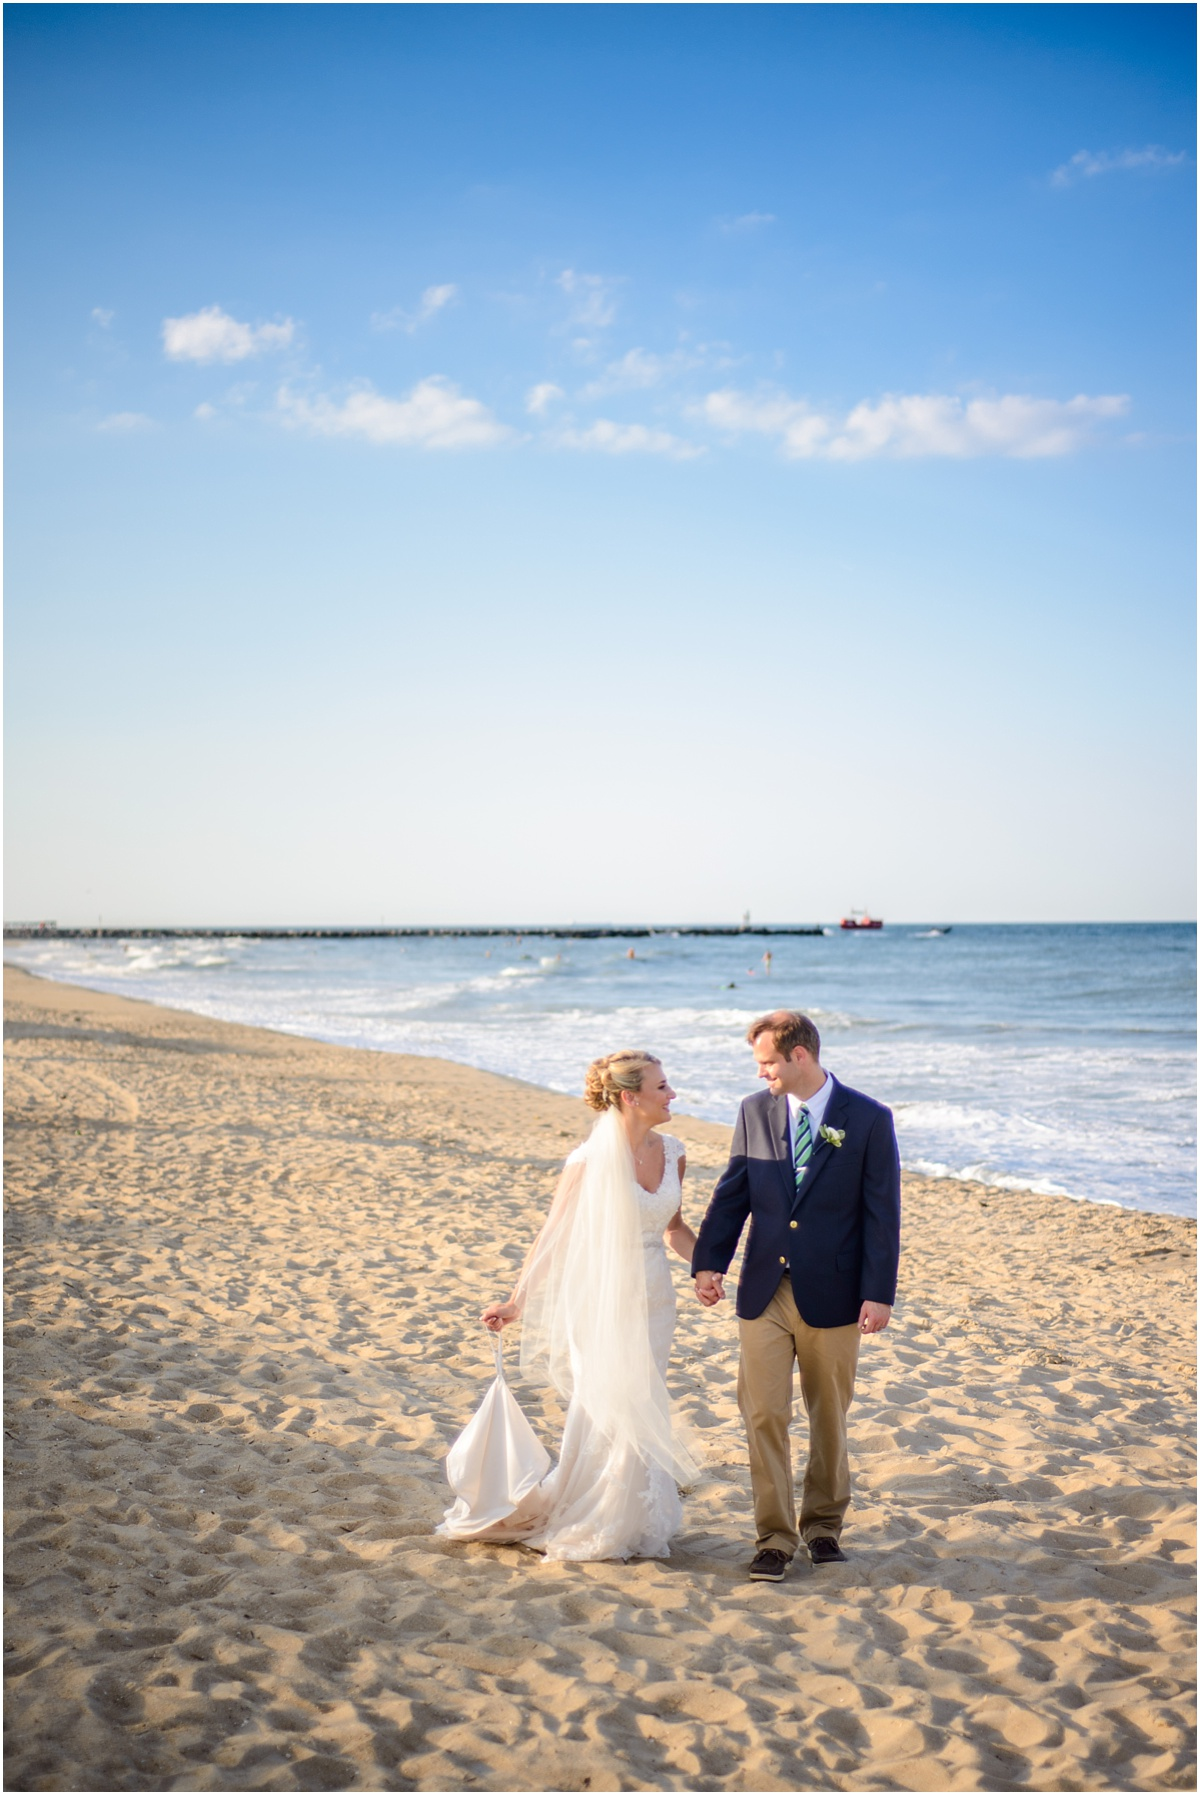 Greg Smit Photography Virginia Beach Destination wedding photographer_0042